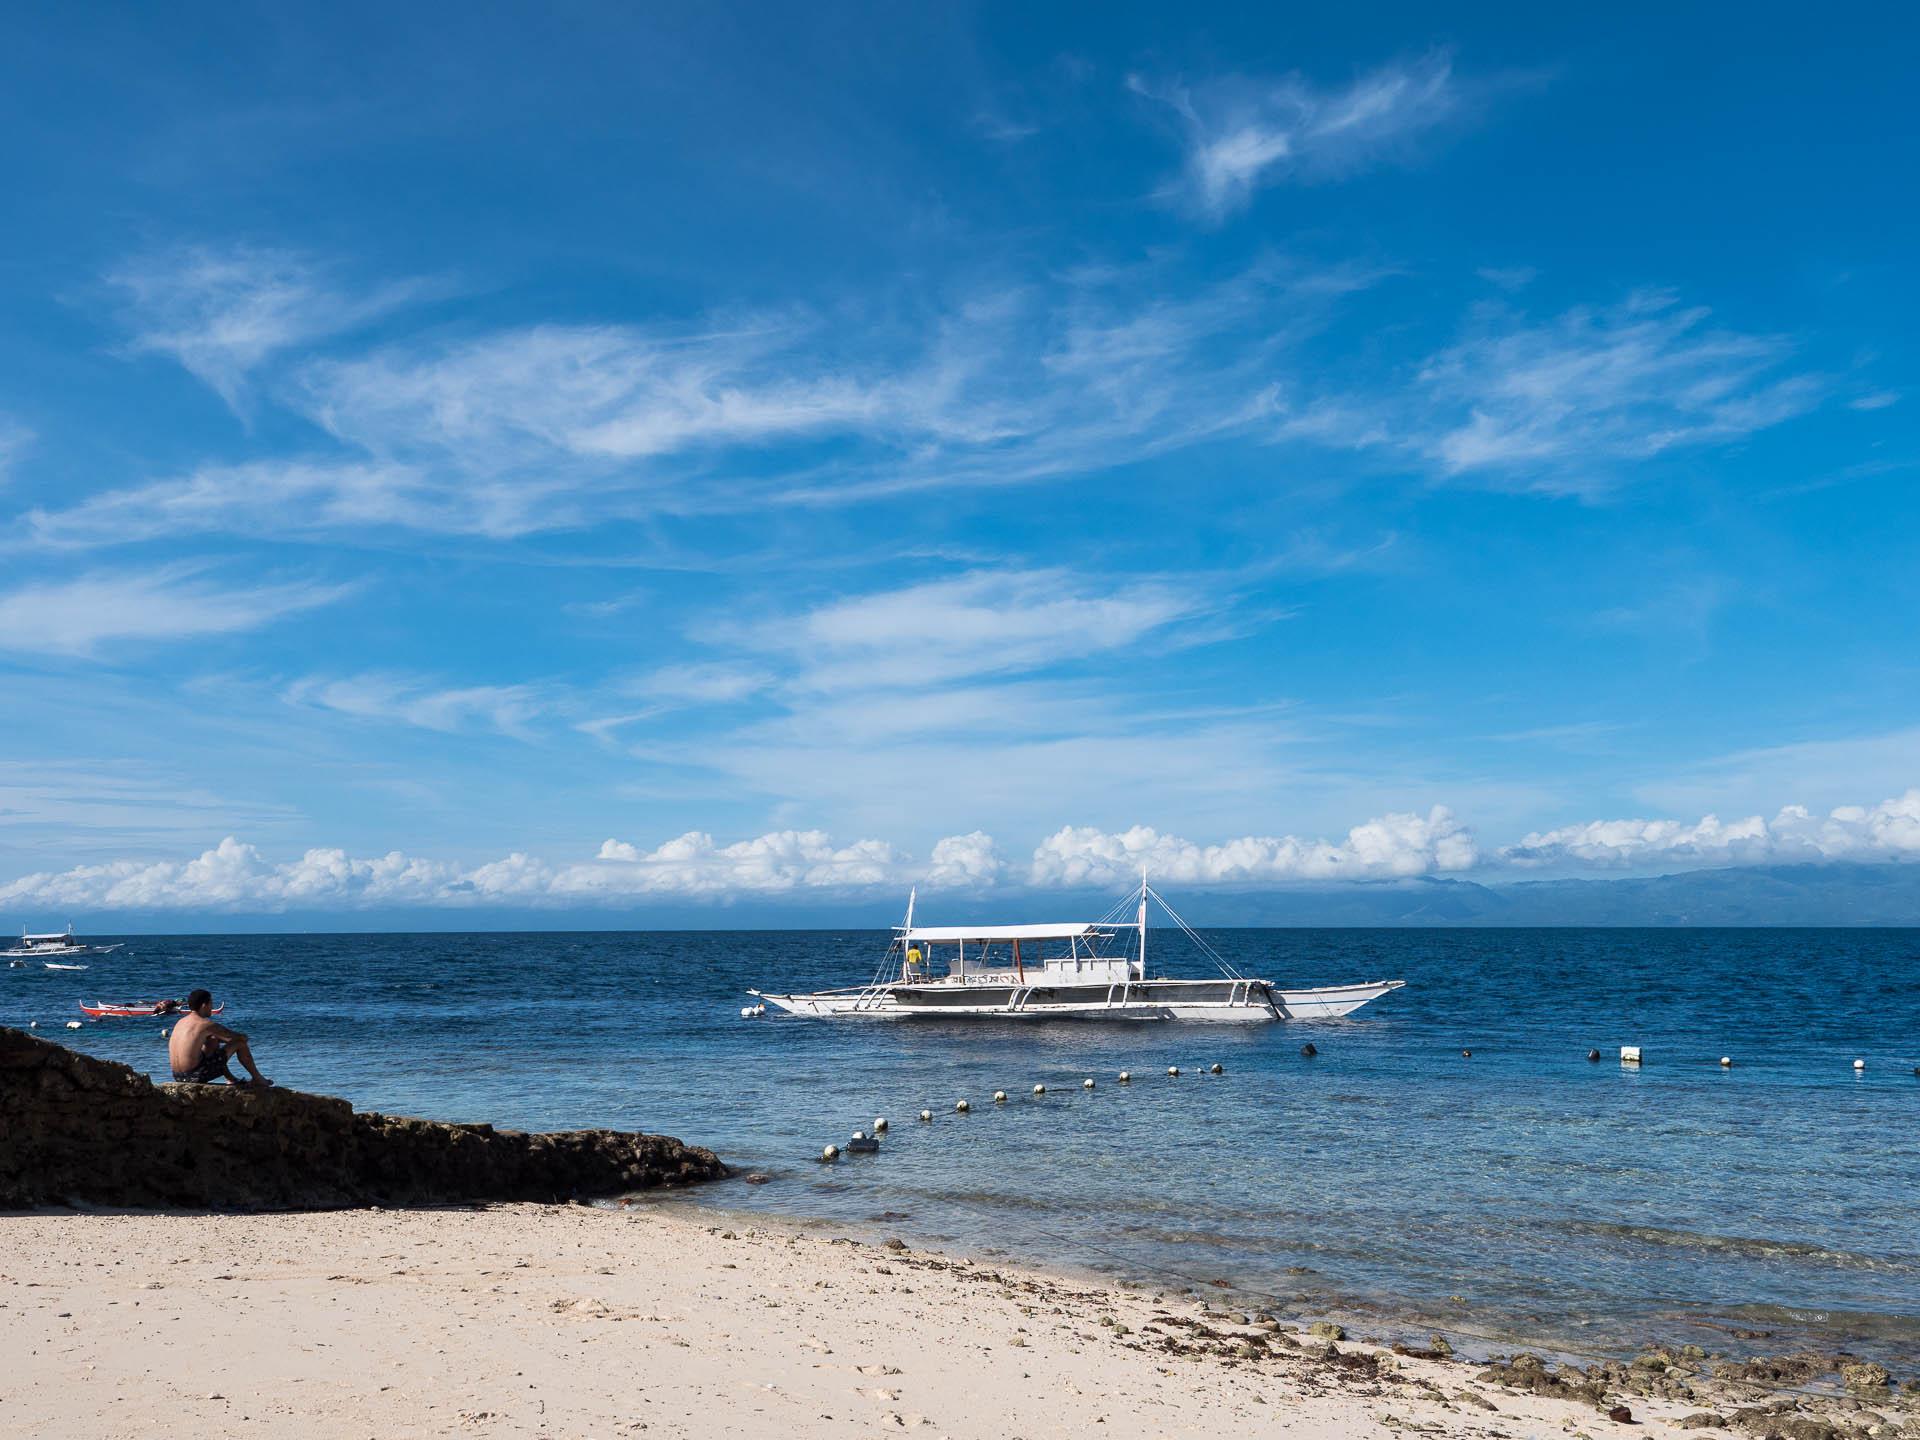 Moalboal plage - Les globe blogueurs - blog voyage nature